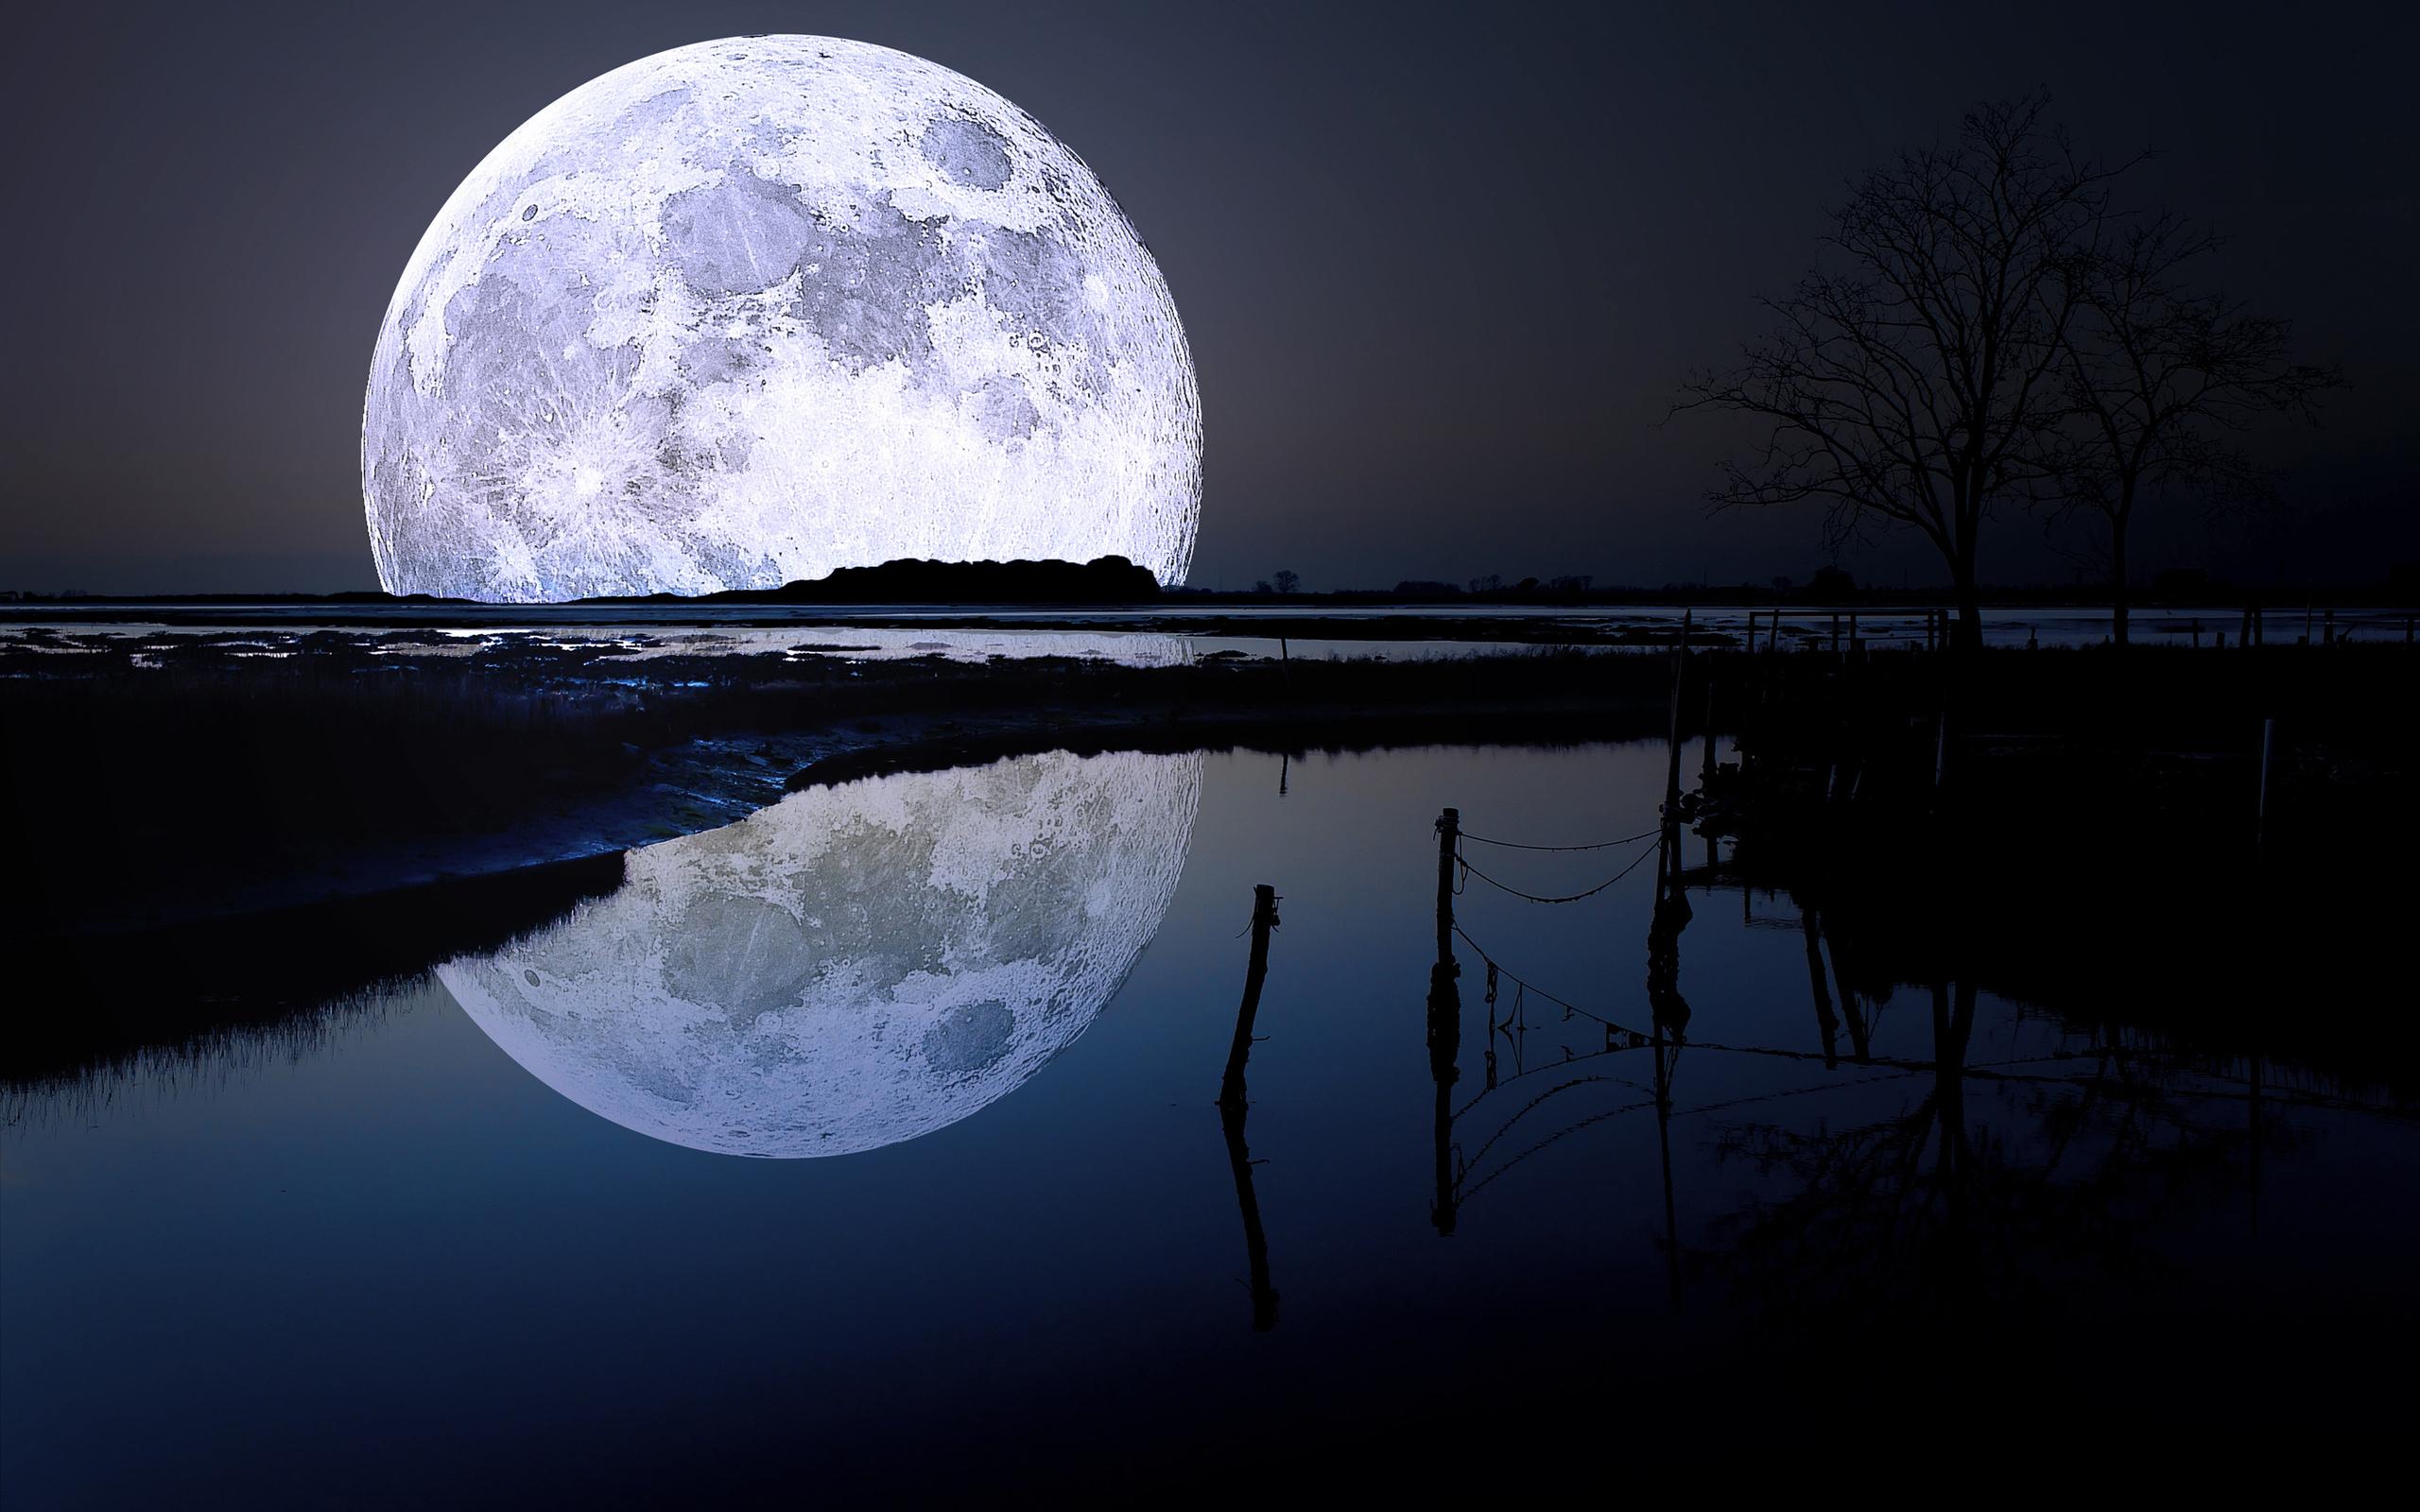 Картинка с луной